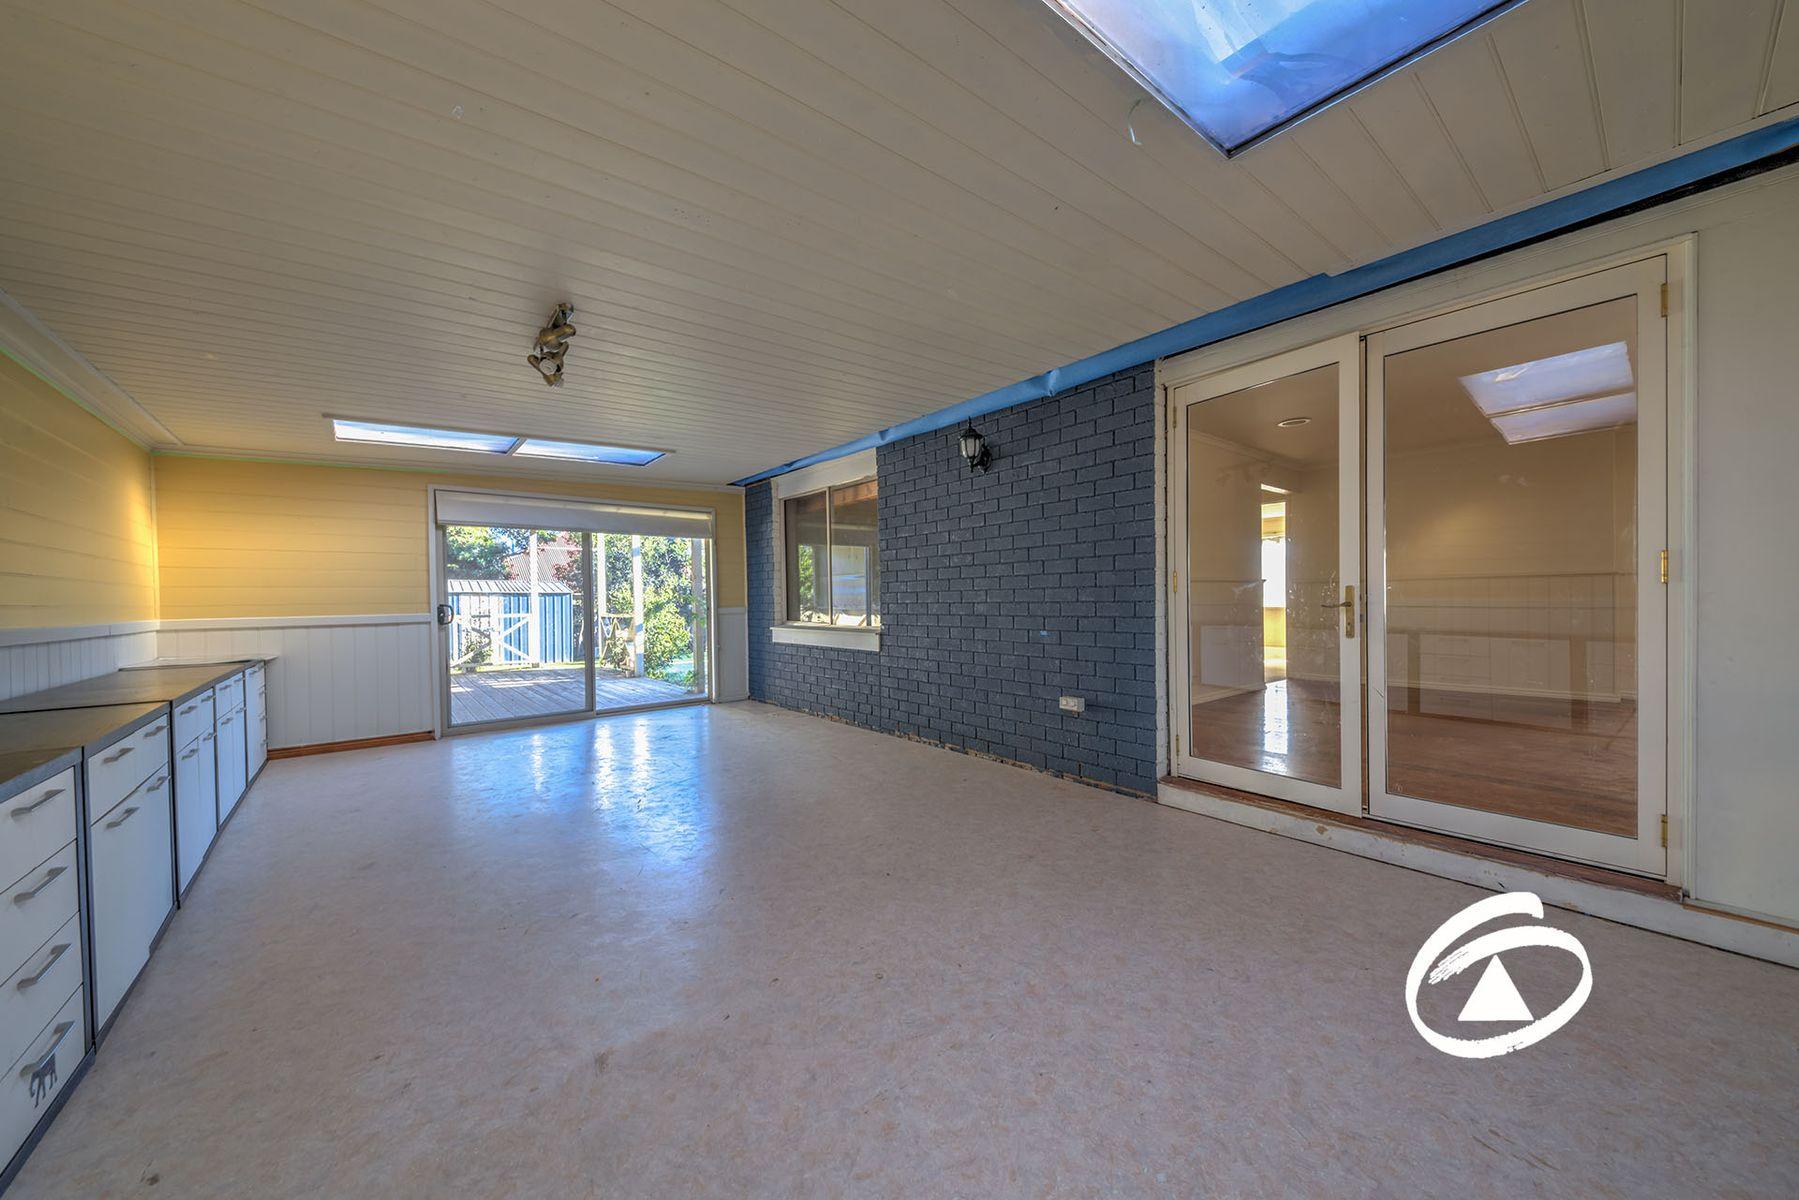 54 Beethoven Drive, Narre Warren South, VIC 3805